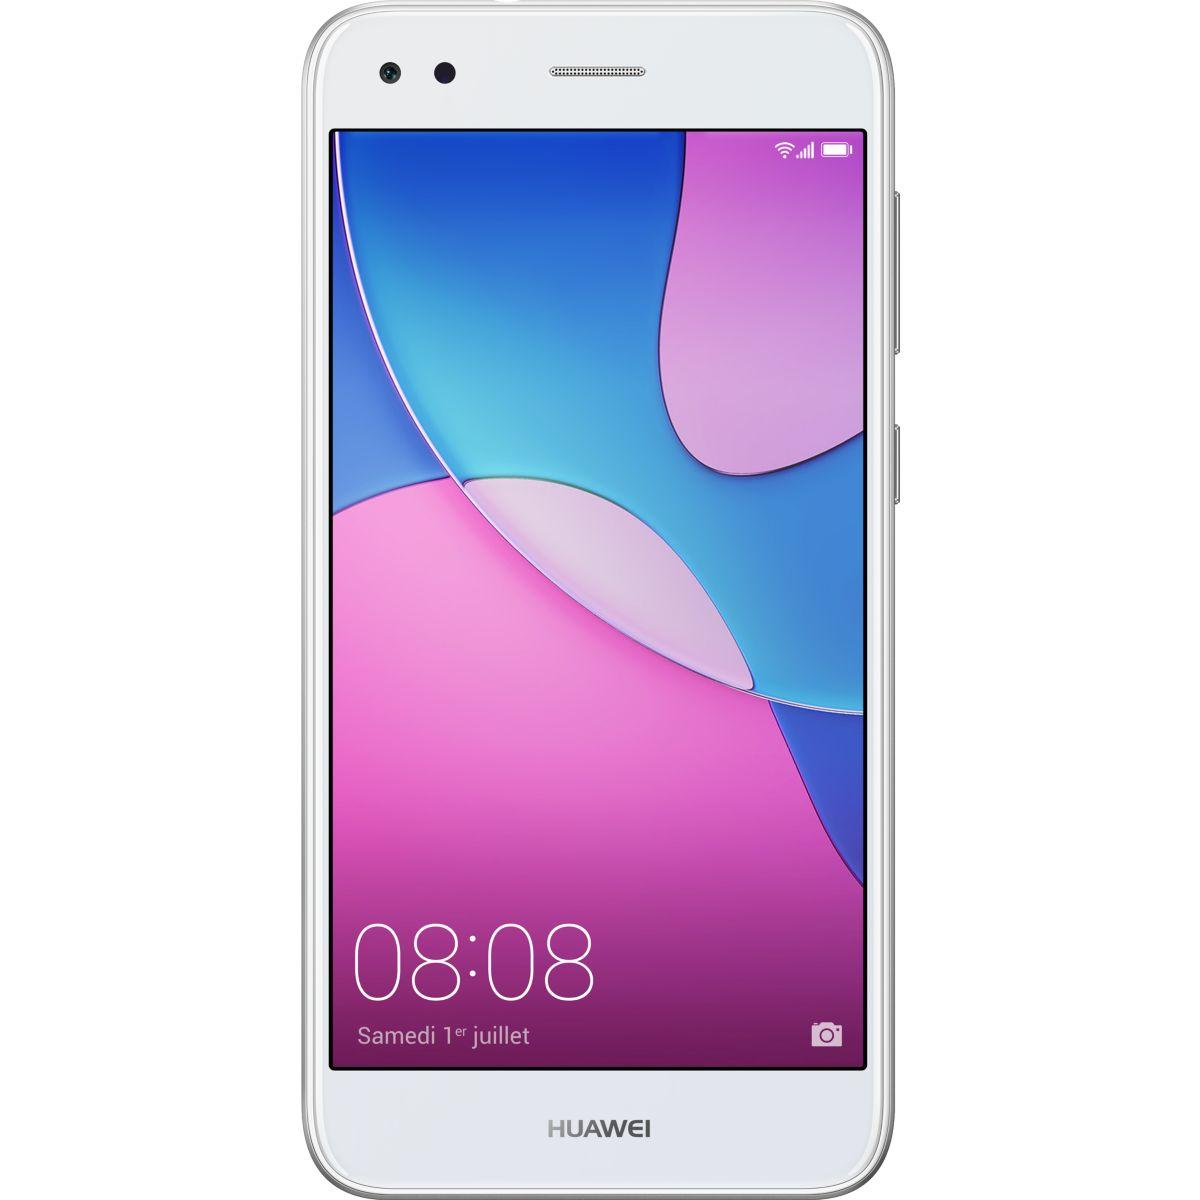 Smartphone huawei y6 pro silver blanc - 2% de remise imm?diate avec le code : wd2